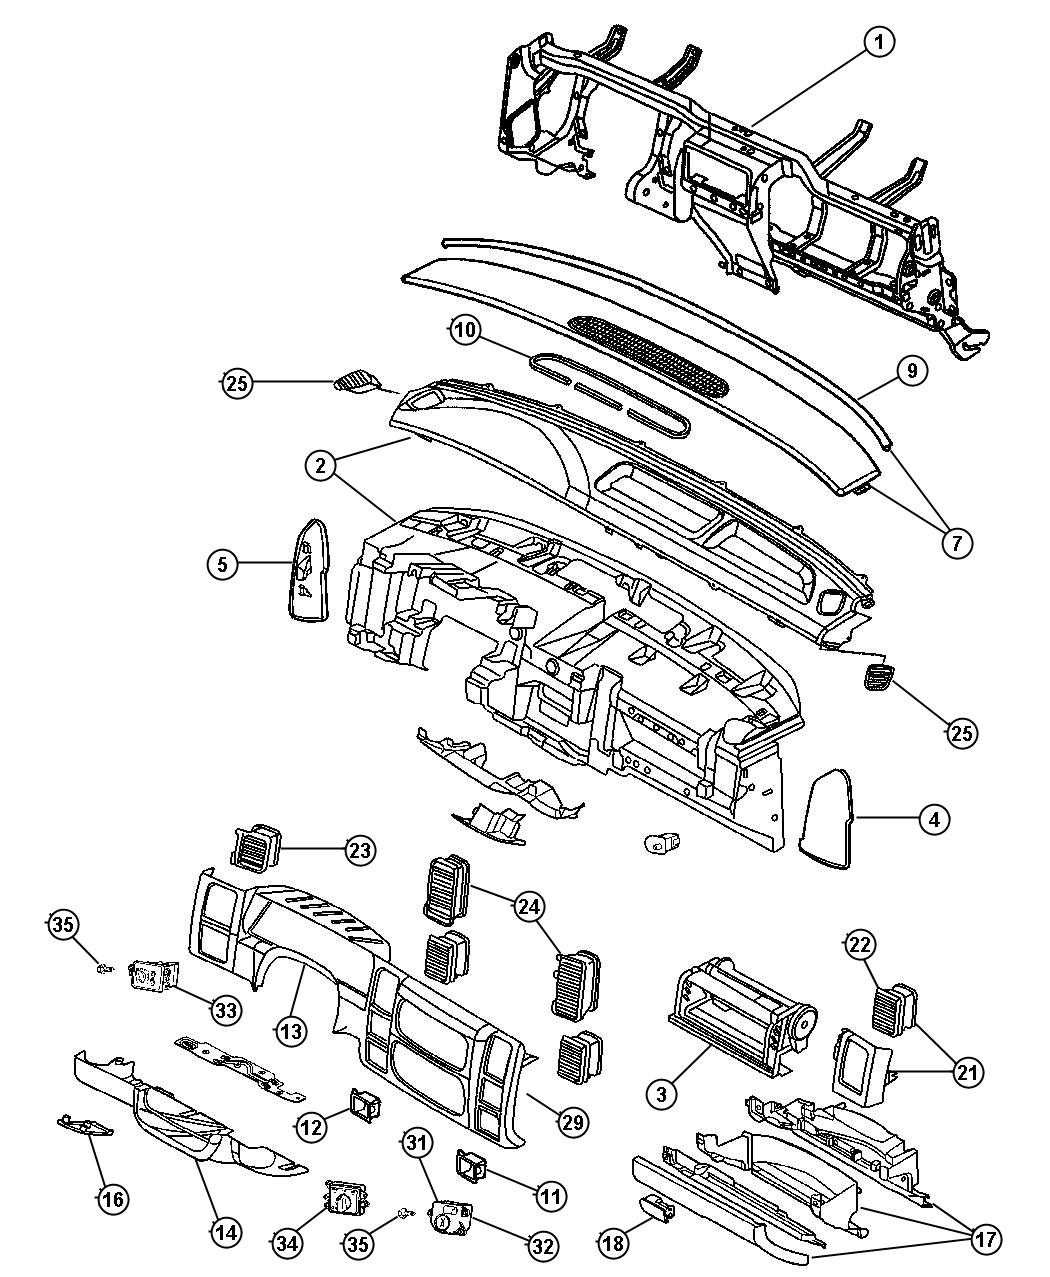 tags: #2003 silverado 1500 instrument cluster#2004 chevy silverado  instrument cluster wiring diagram#1989 silverado instrument cluster diagram#2003  chevy